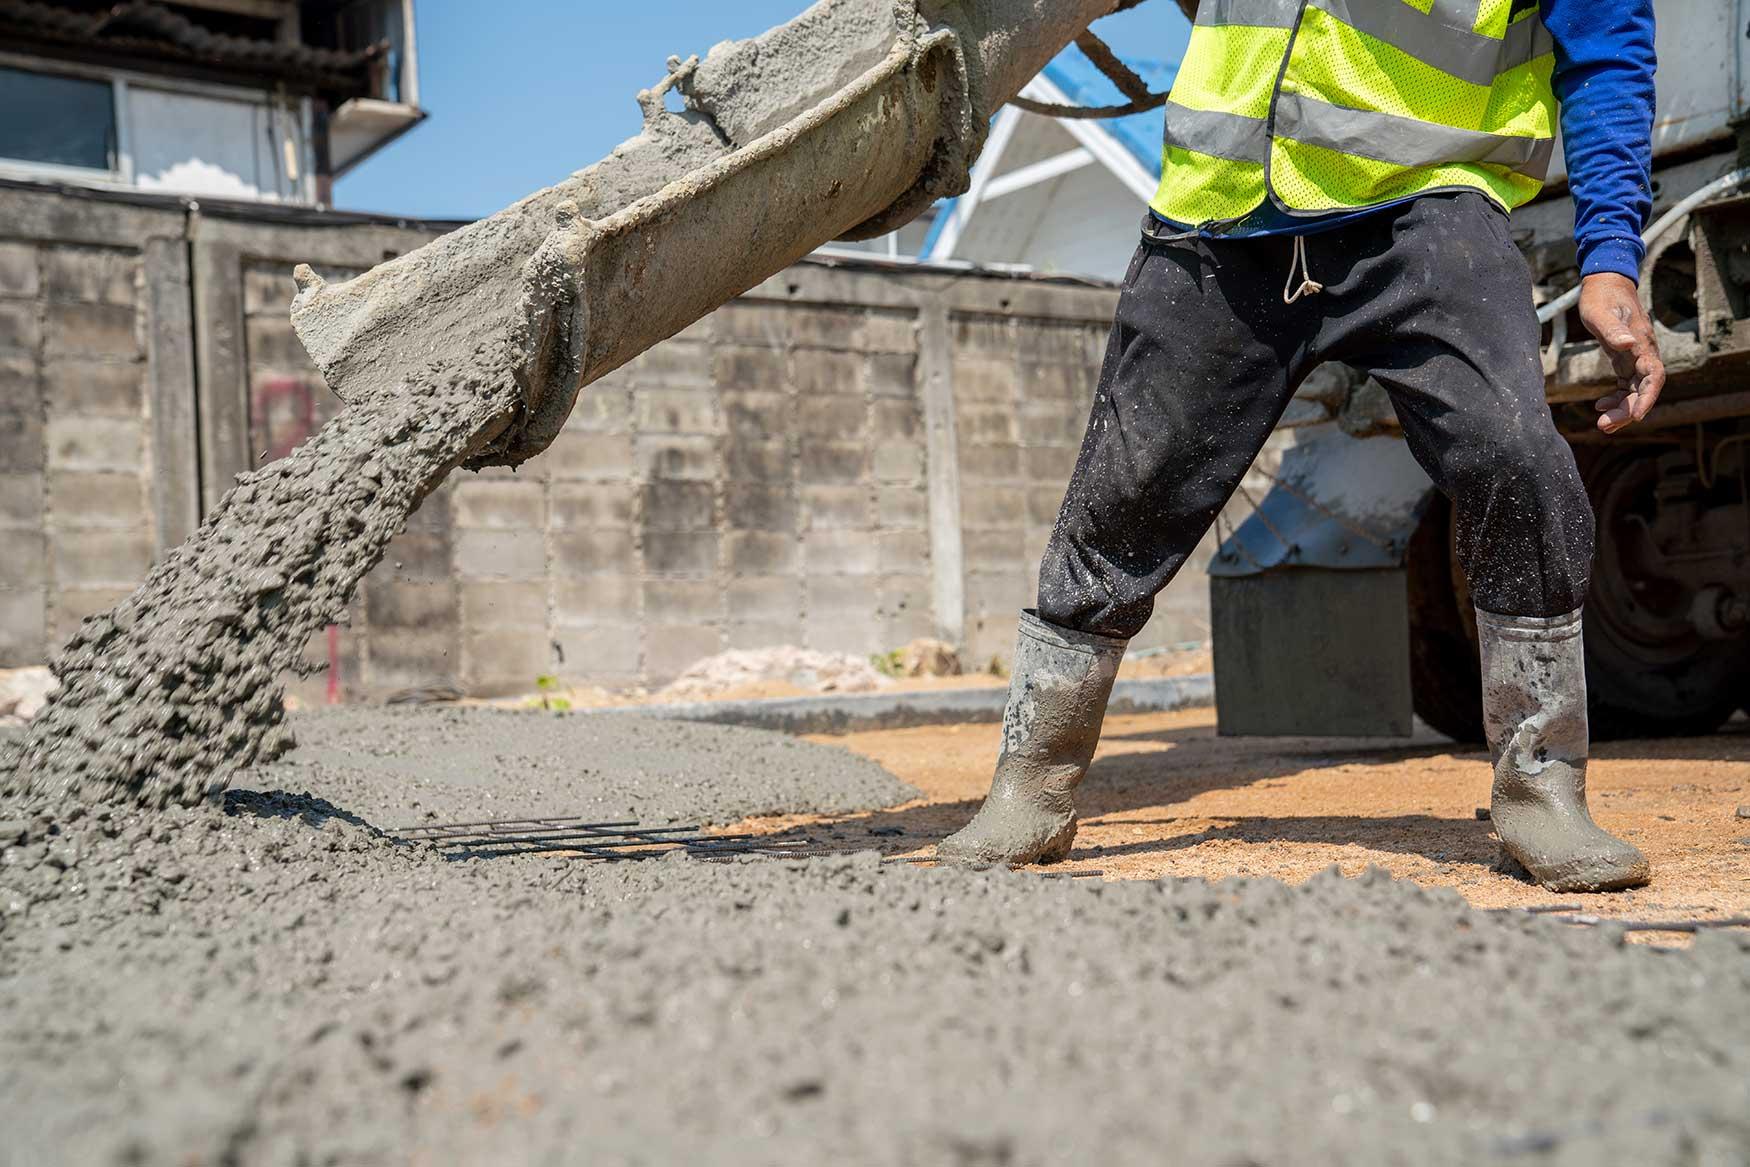 Купить бетон в одинцово ззбо златоуст купить бетон